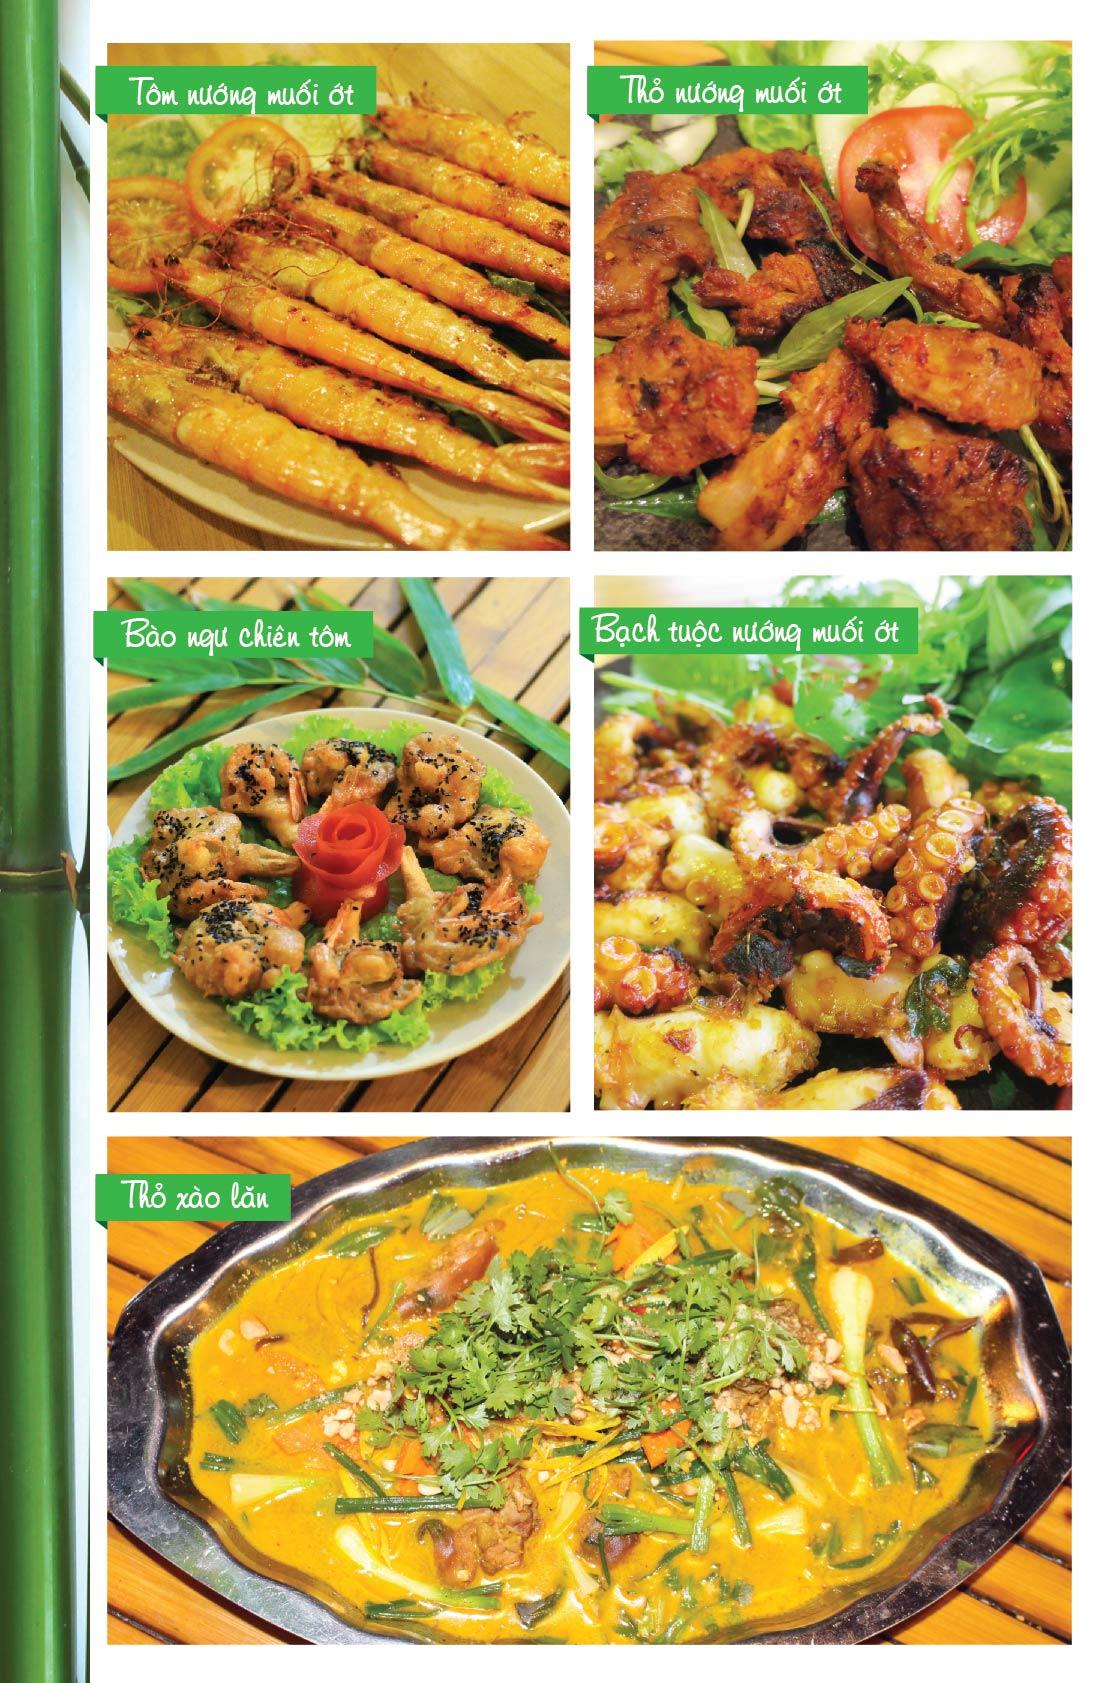 17-10_menu-bamboo-11